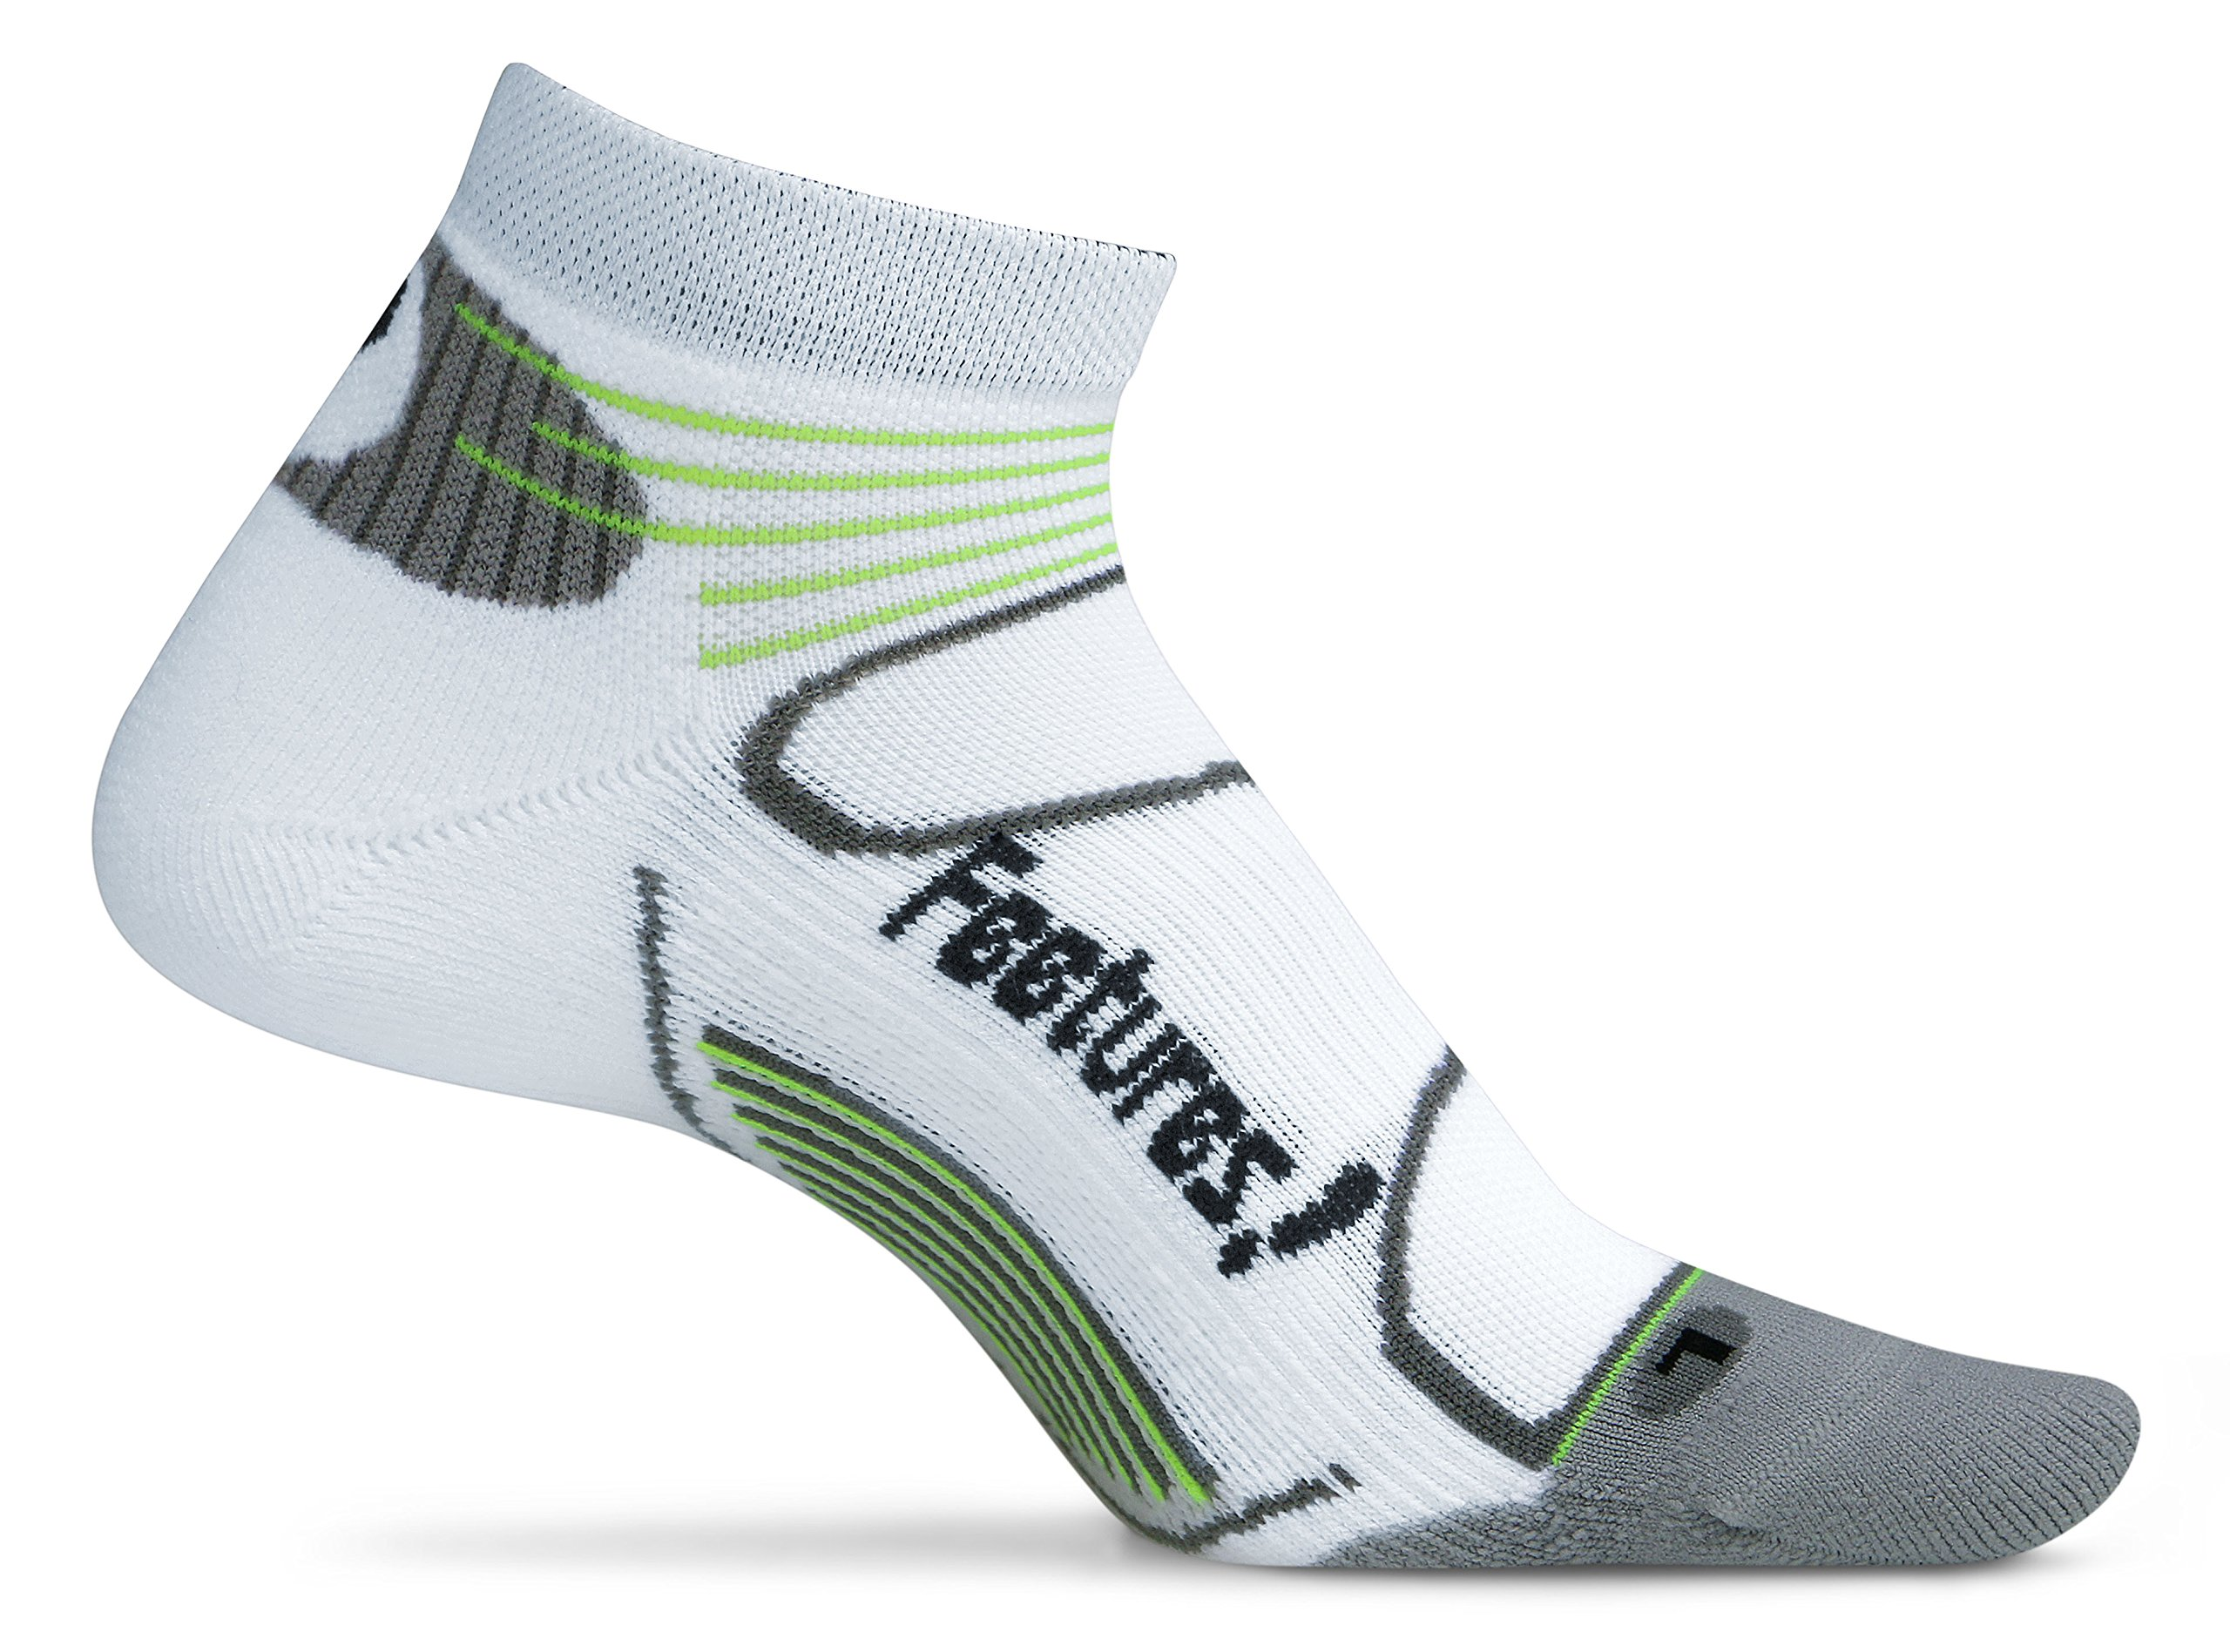 Feetures! Elite Light Cushion Low Cut Cotton/Nylon Socks, Large, White/Black